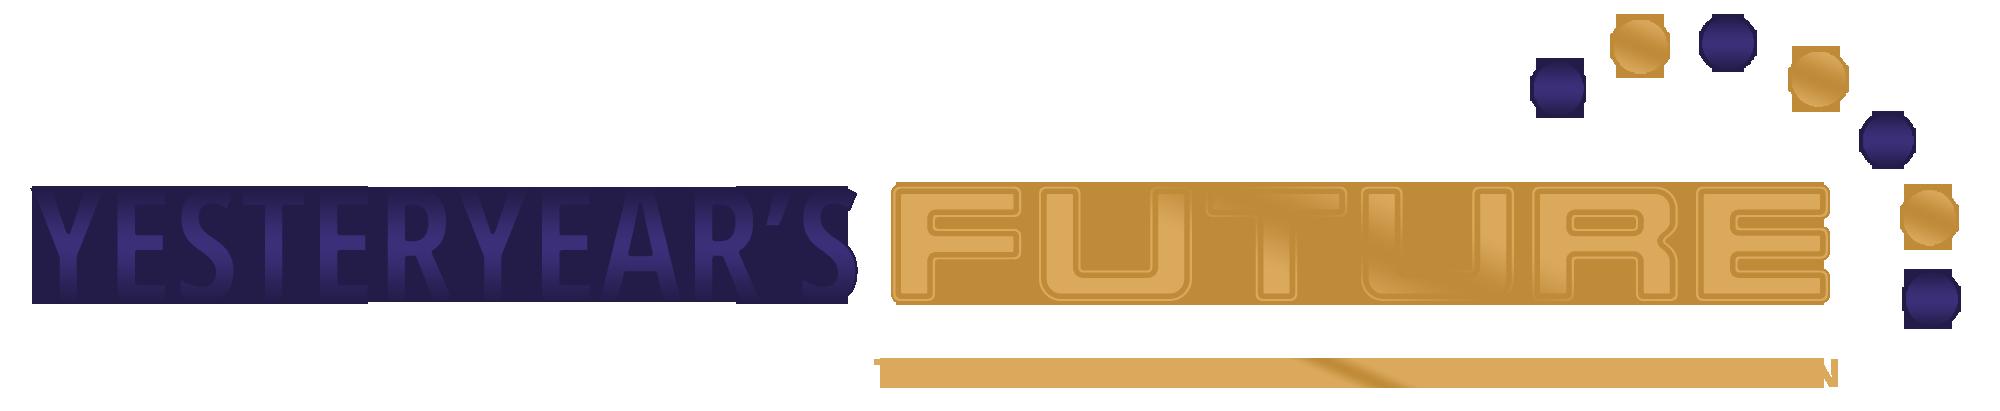 Yesteryear's Future logo